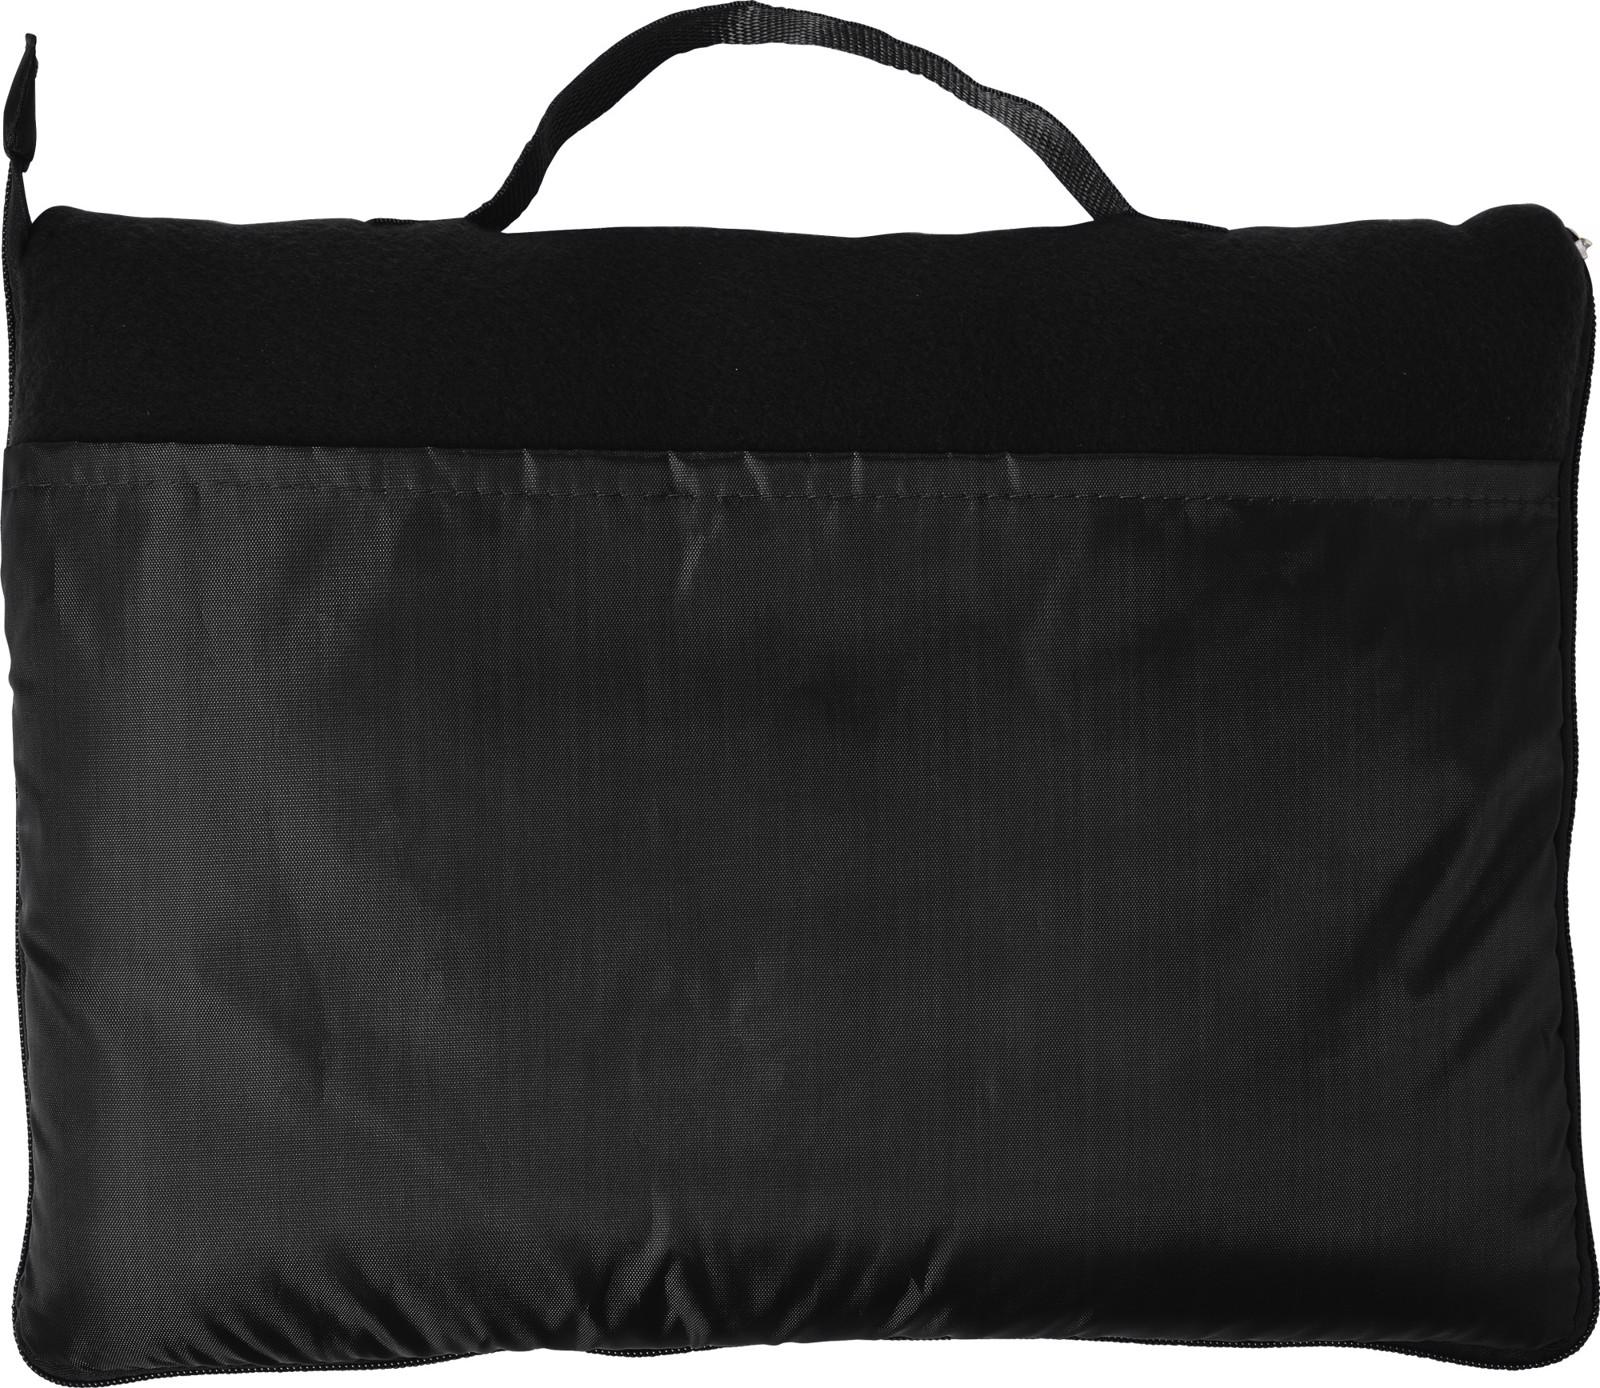 Fleece (180 gr/m²) blanket - Black